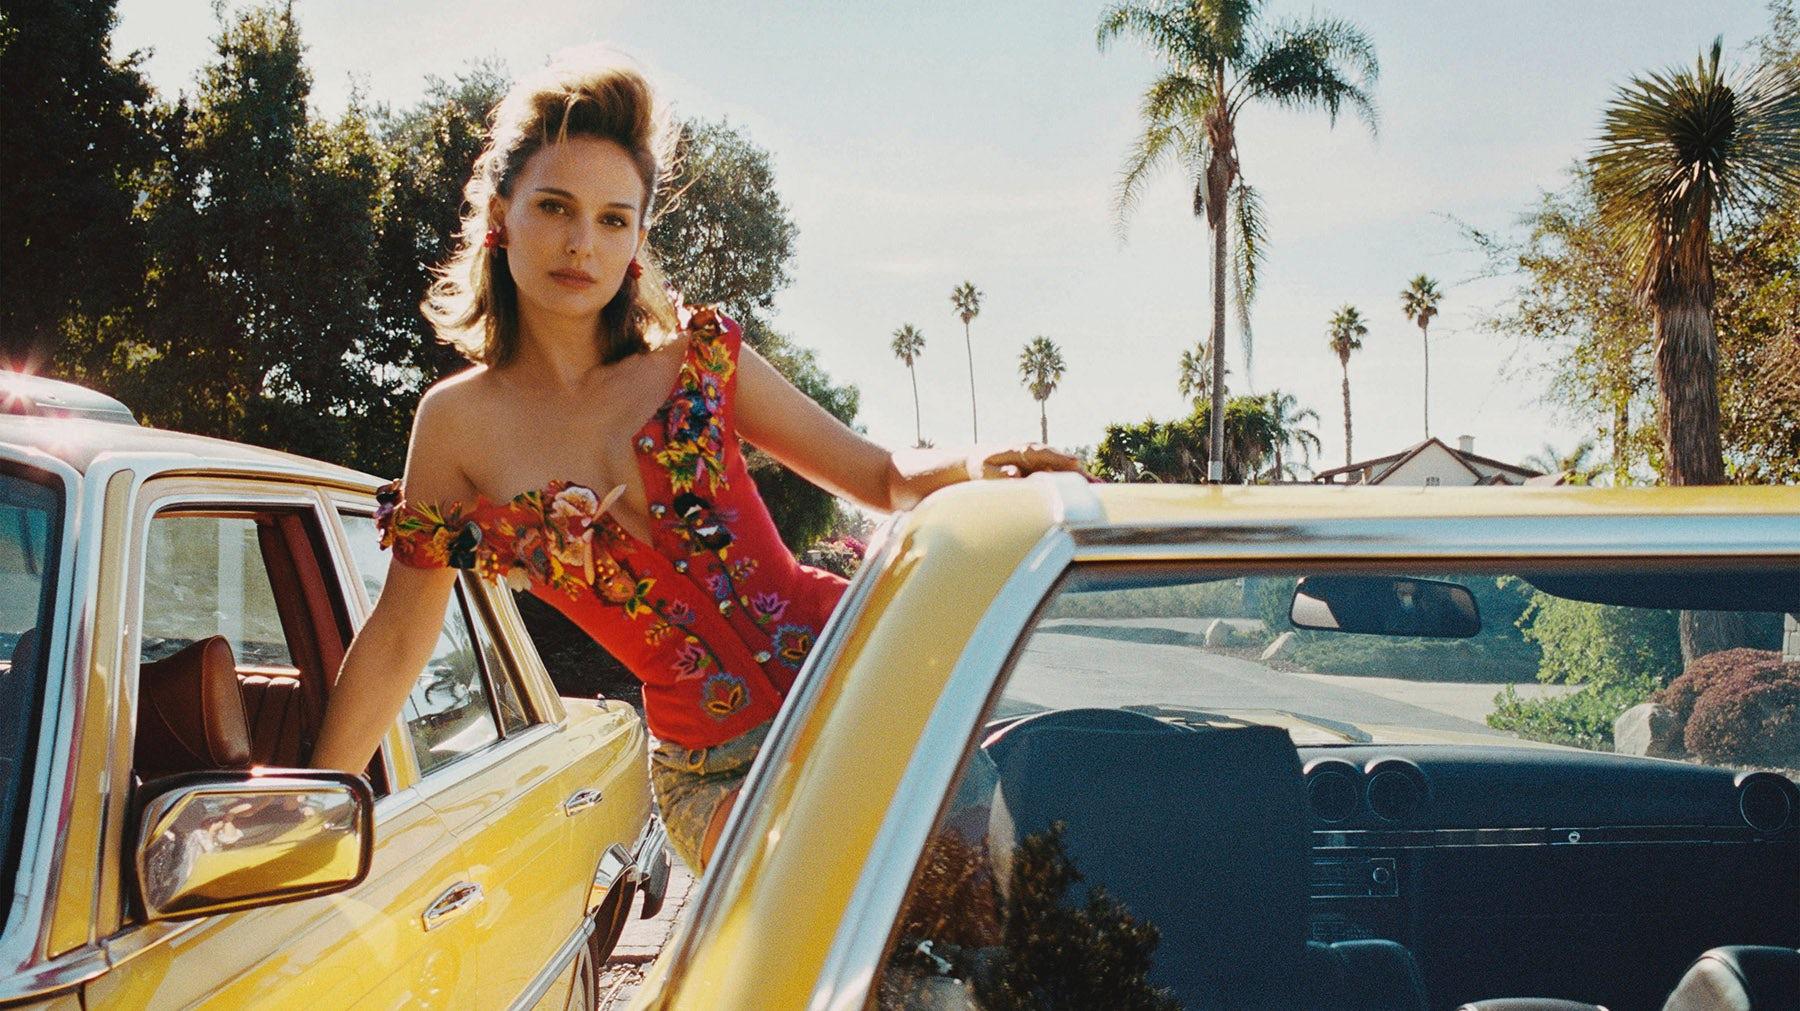 Porter's digital campaign featuring Natalie Portman | Source: YNAP